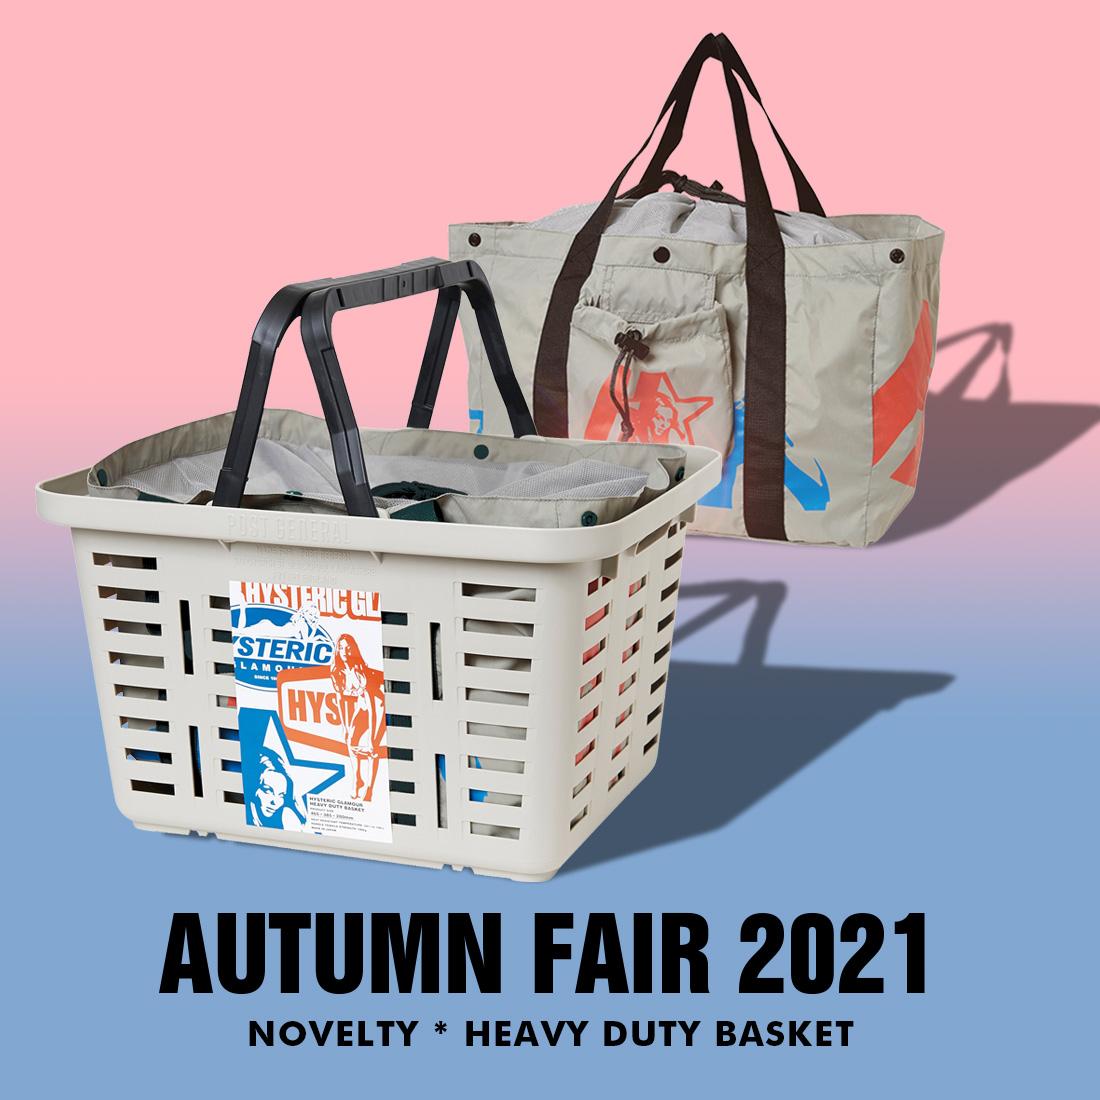 2021 AUTUMN FAIR